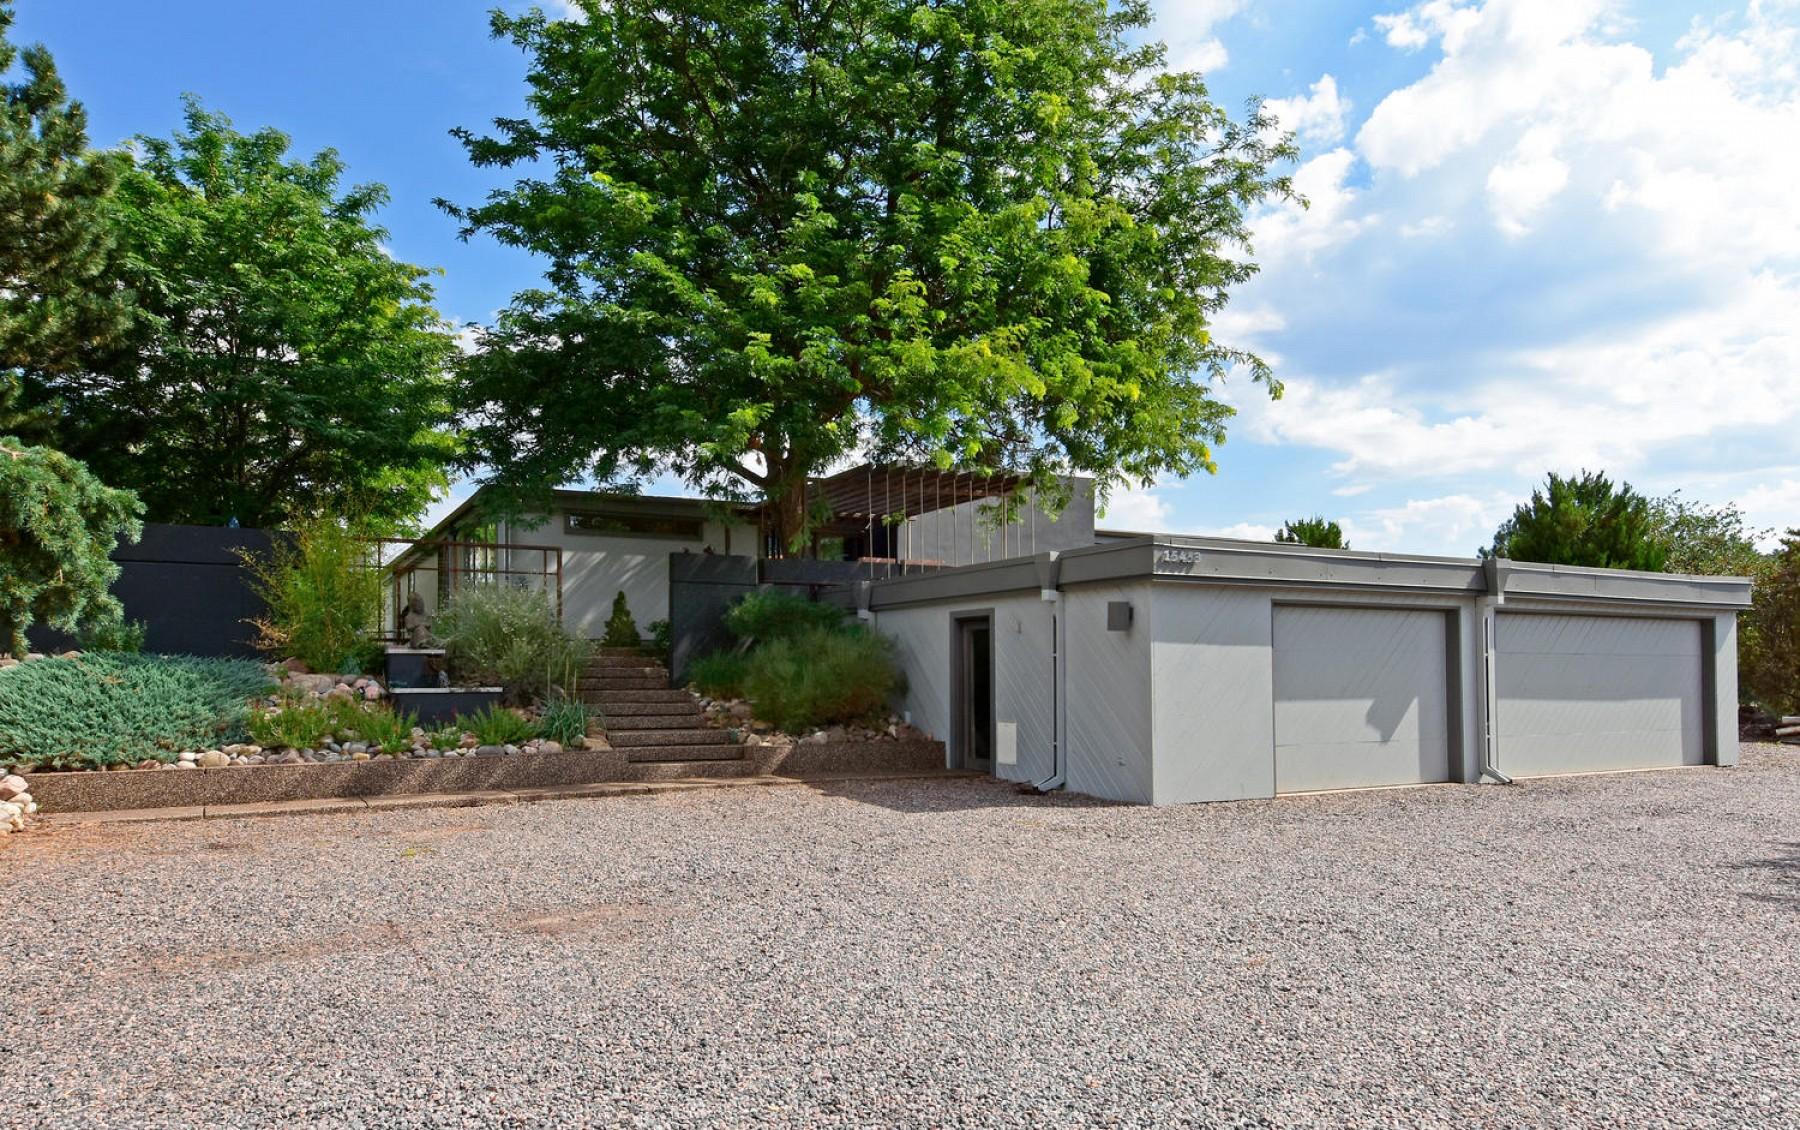 15453 Willowbrook Lane, Morrison, CO 80465